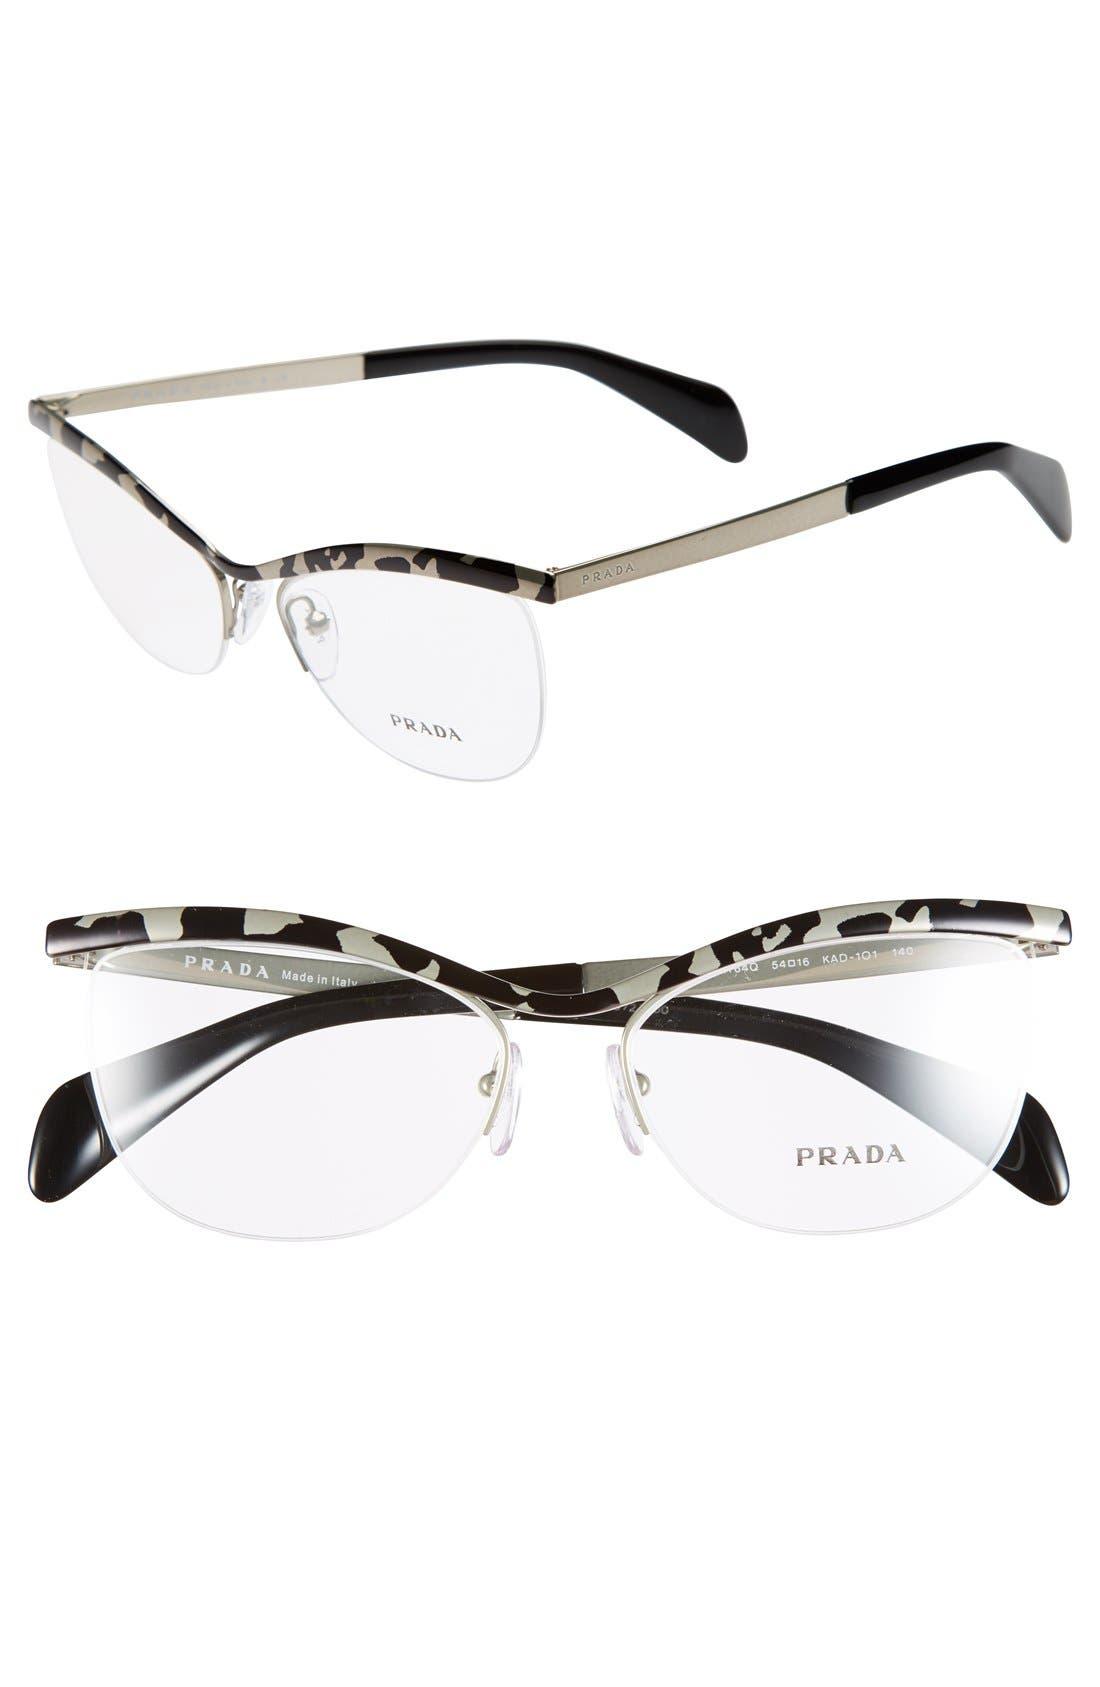 Alternate Image 1 Selected - Prada 54mm Optical Glasses (Online Only)